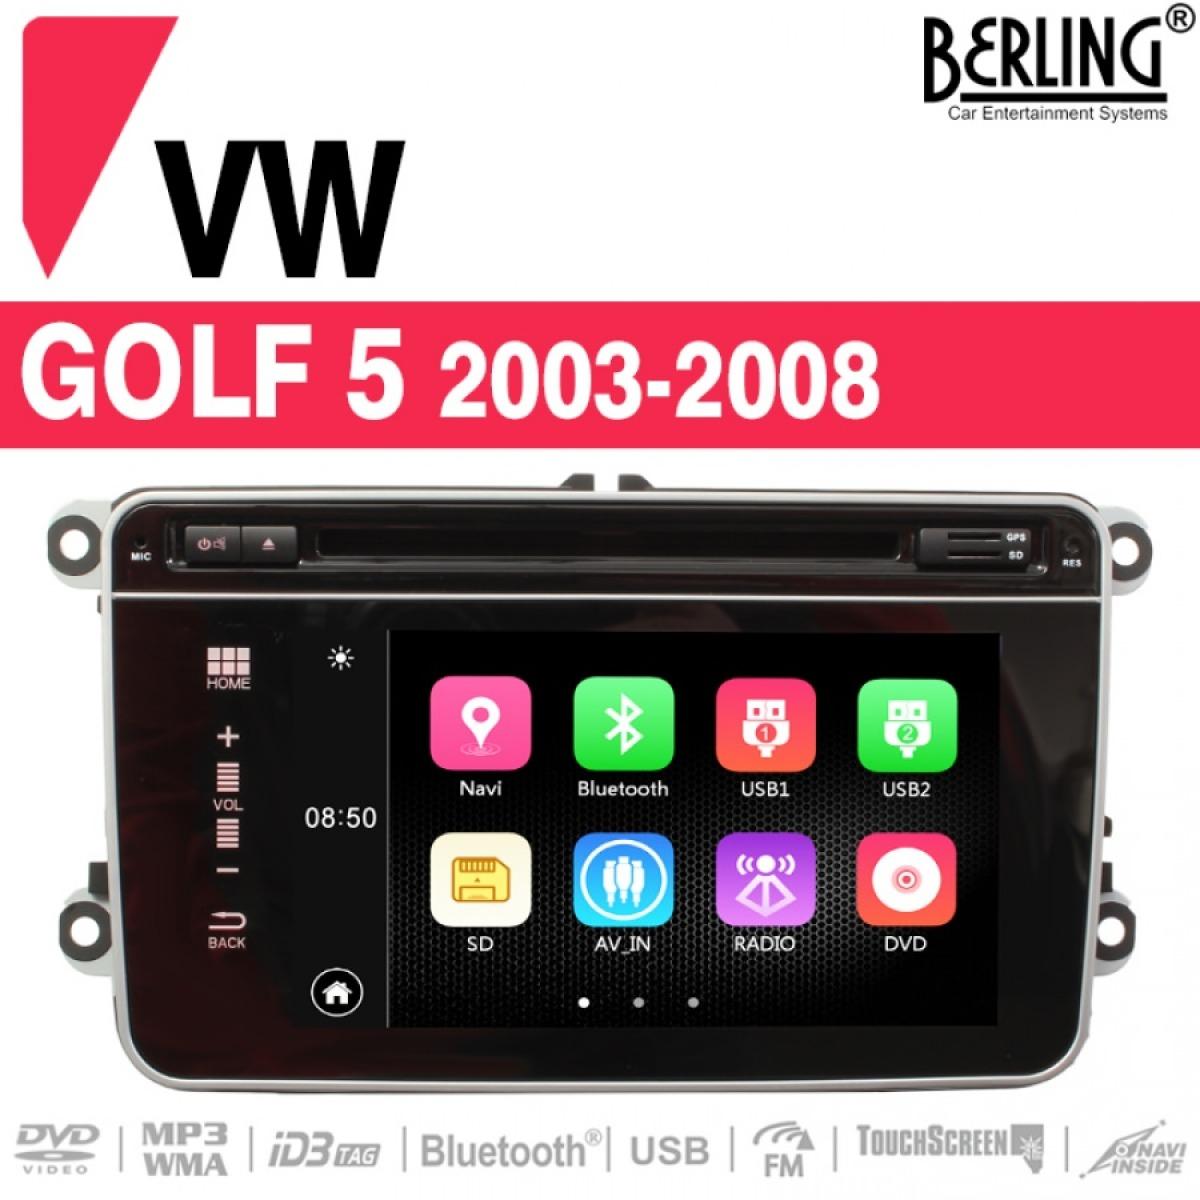 autoradio navigation f r vw golf 5 2003 2008 berling. Black Bedroom Furniture Sets. Home Design Ideas